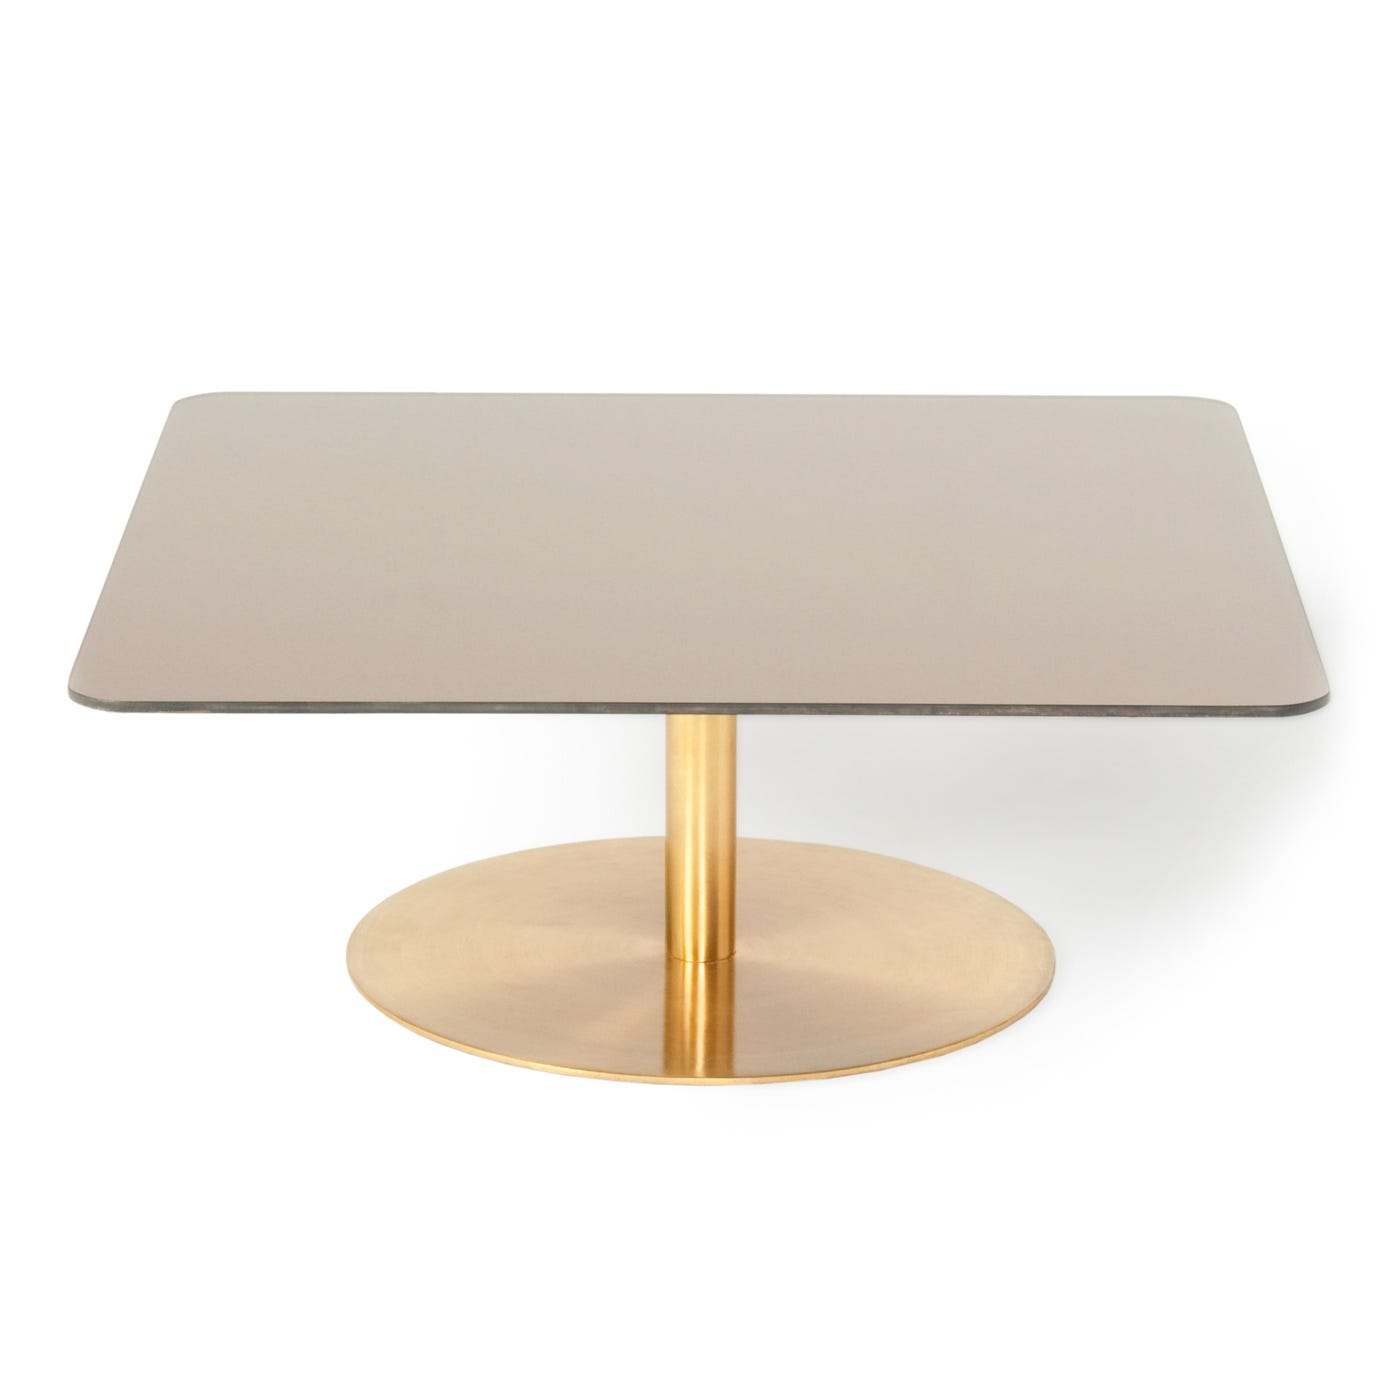 Flash Square Coffee Table